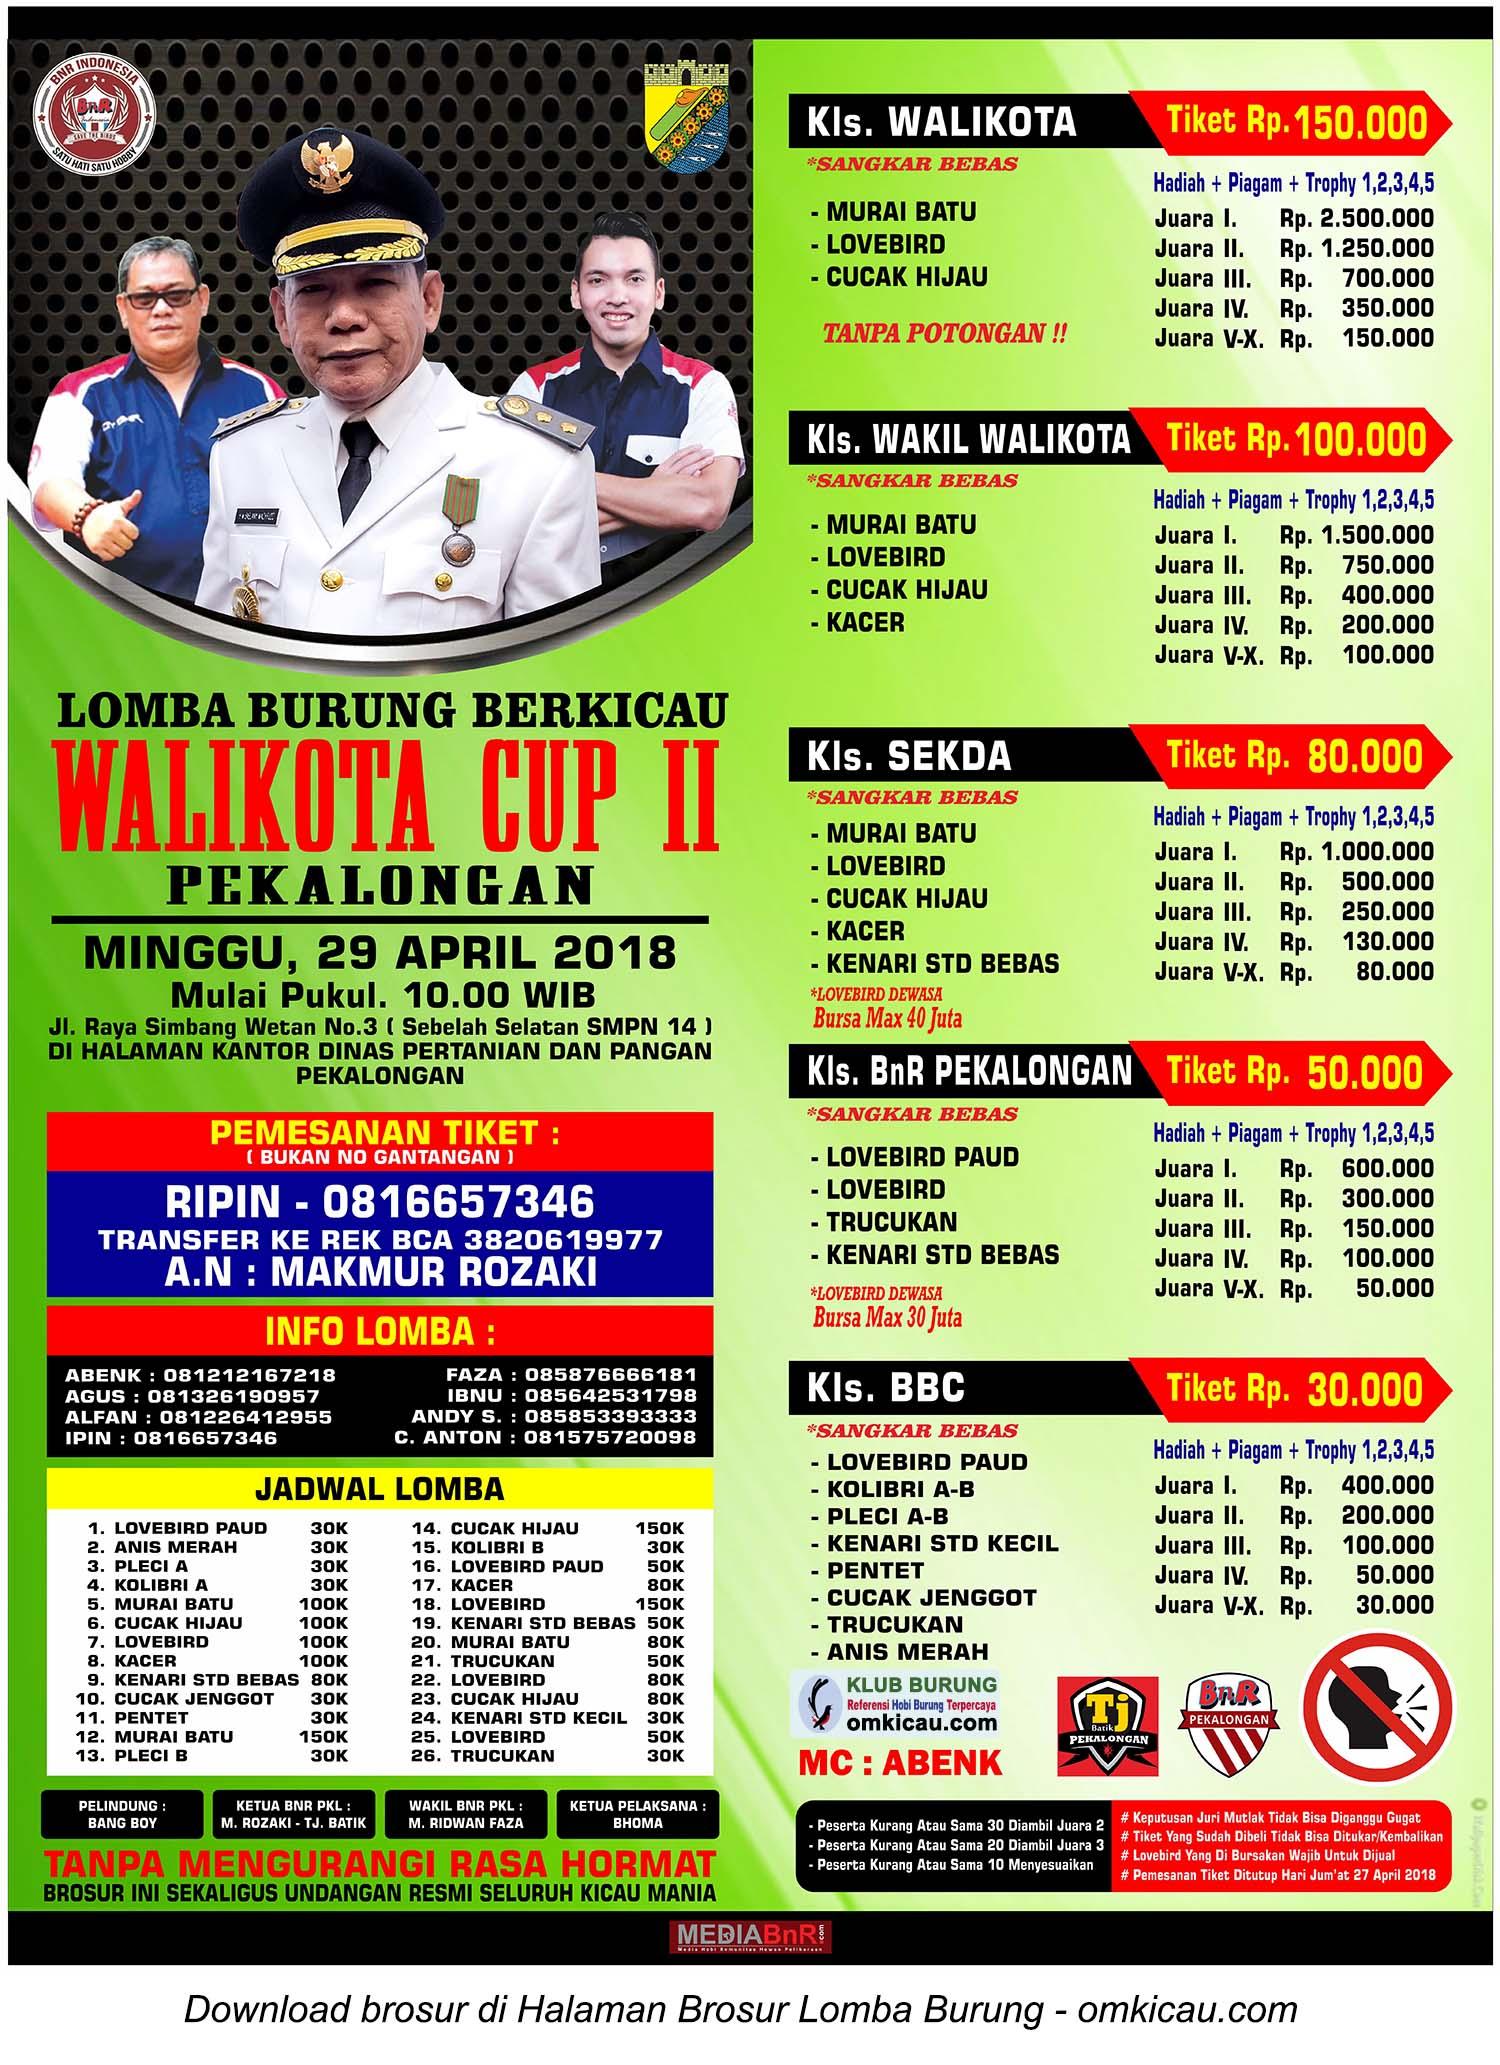 Wali Kota Cup II Pekalongan